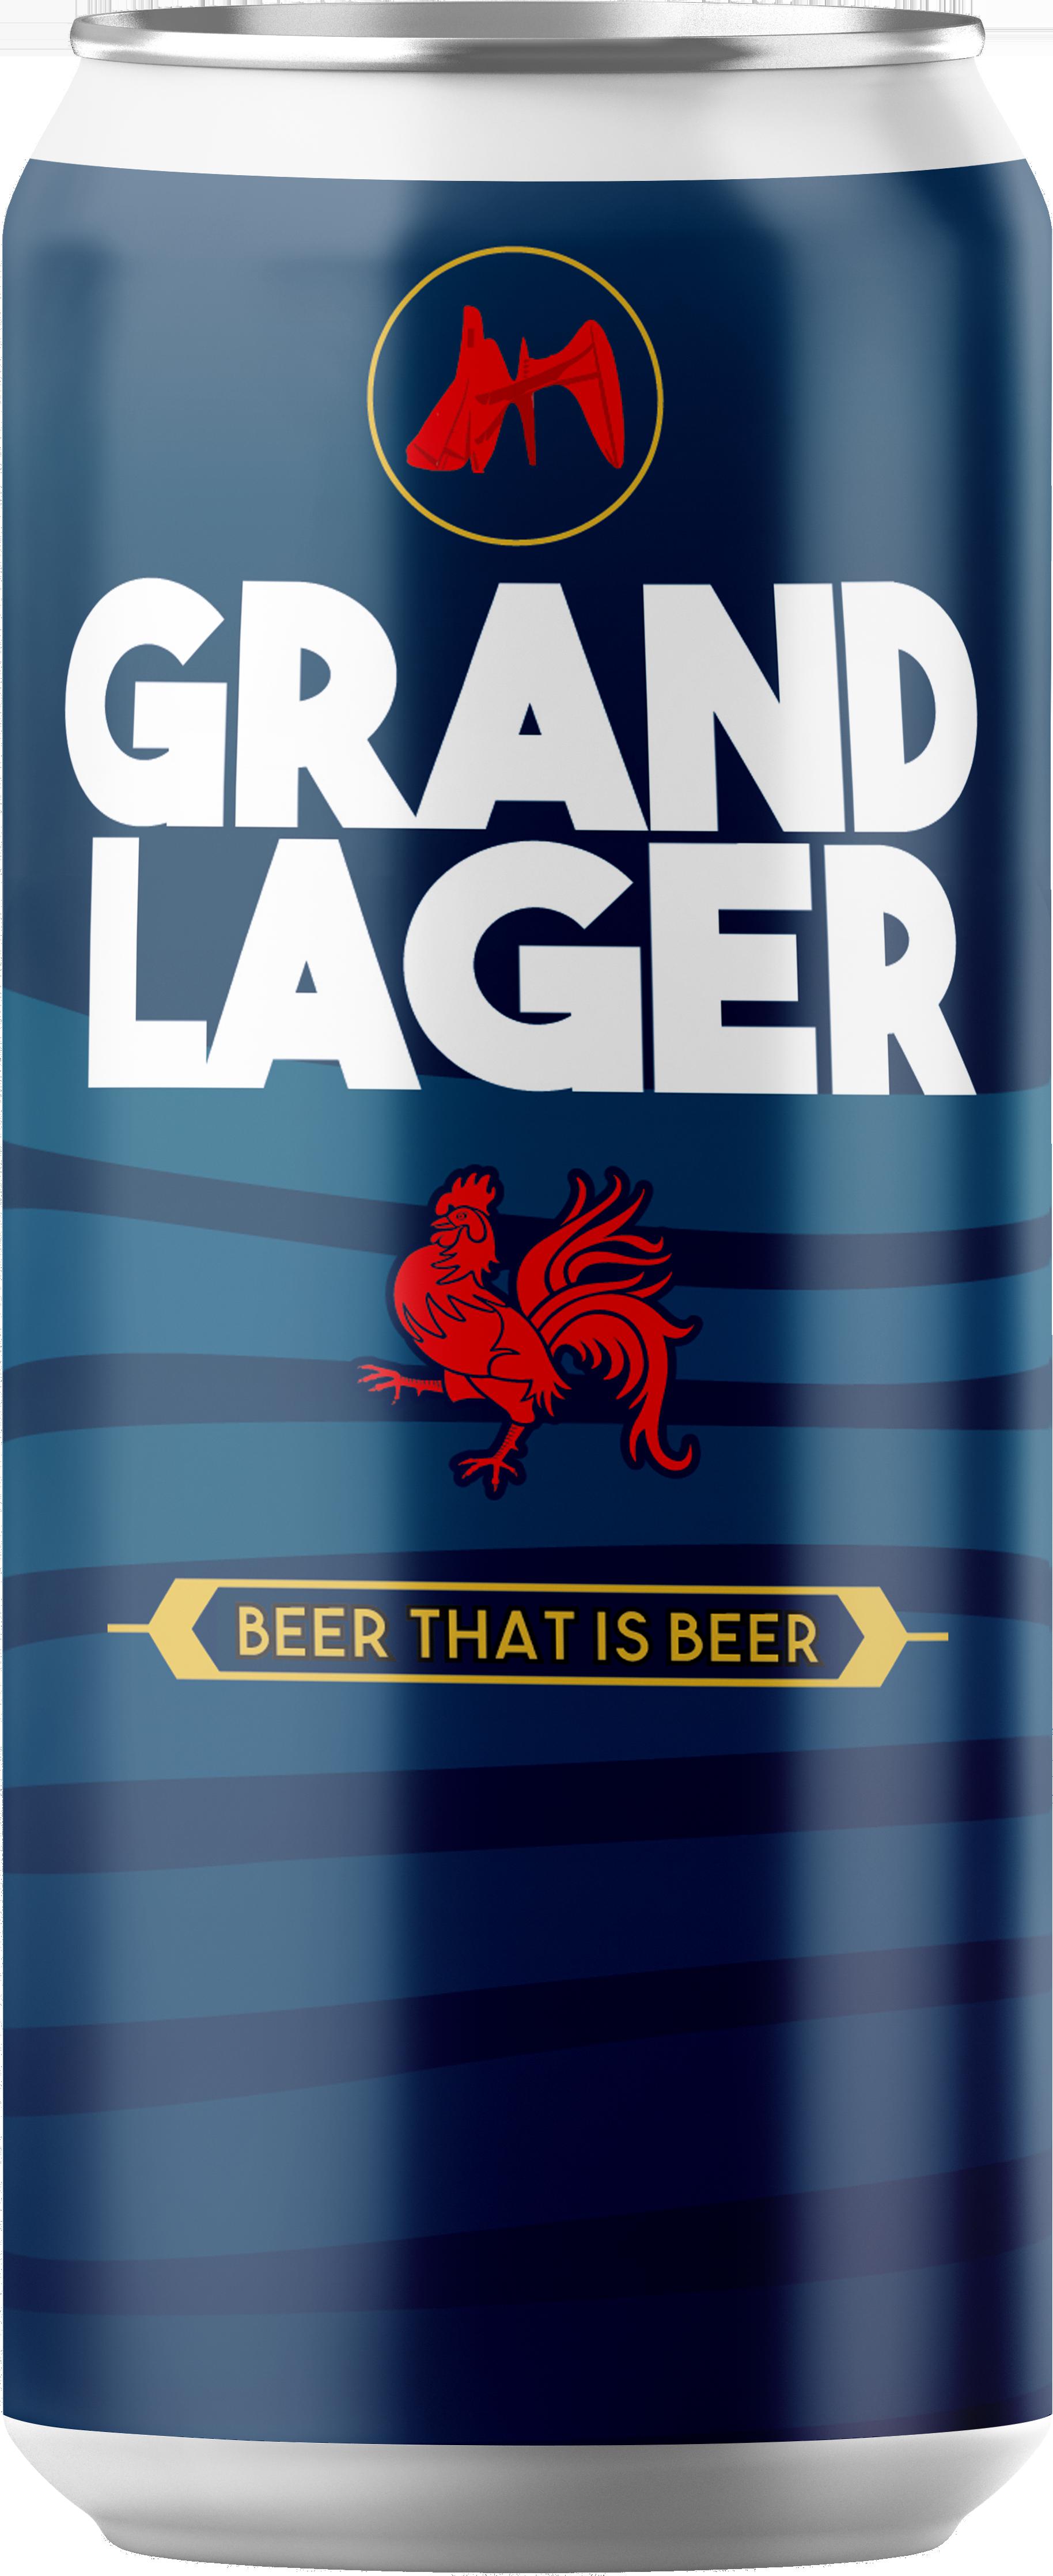 GrandLagercanwrap